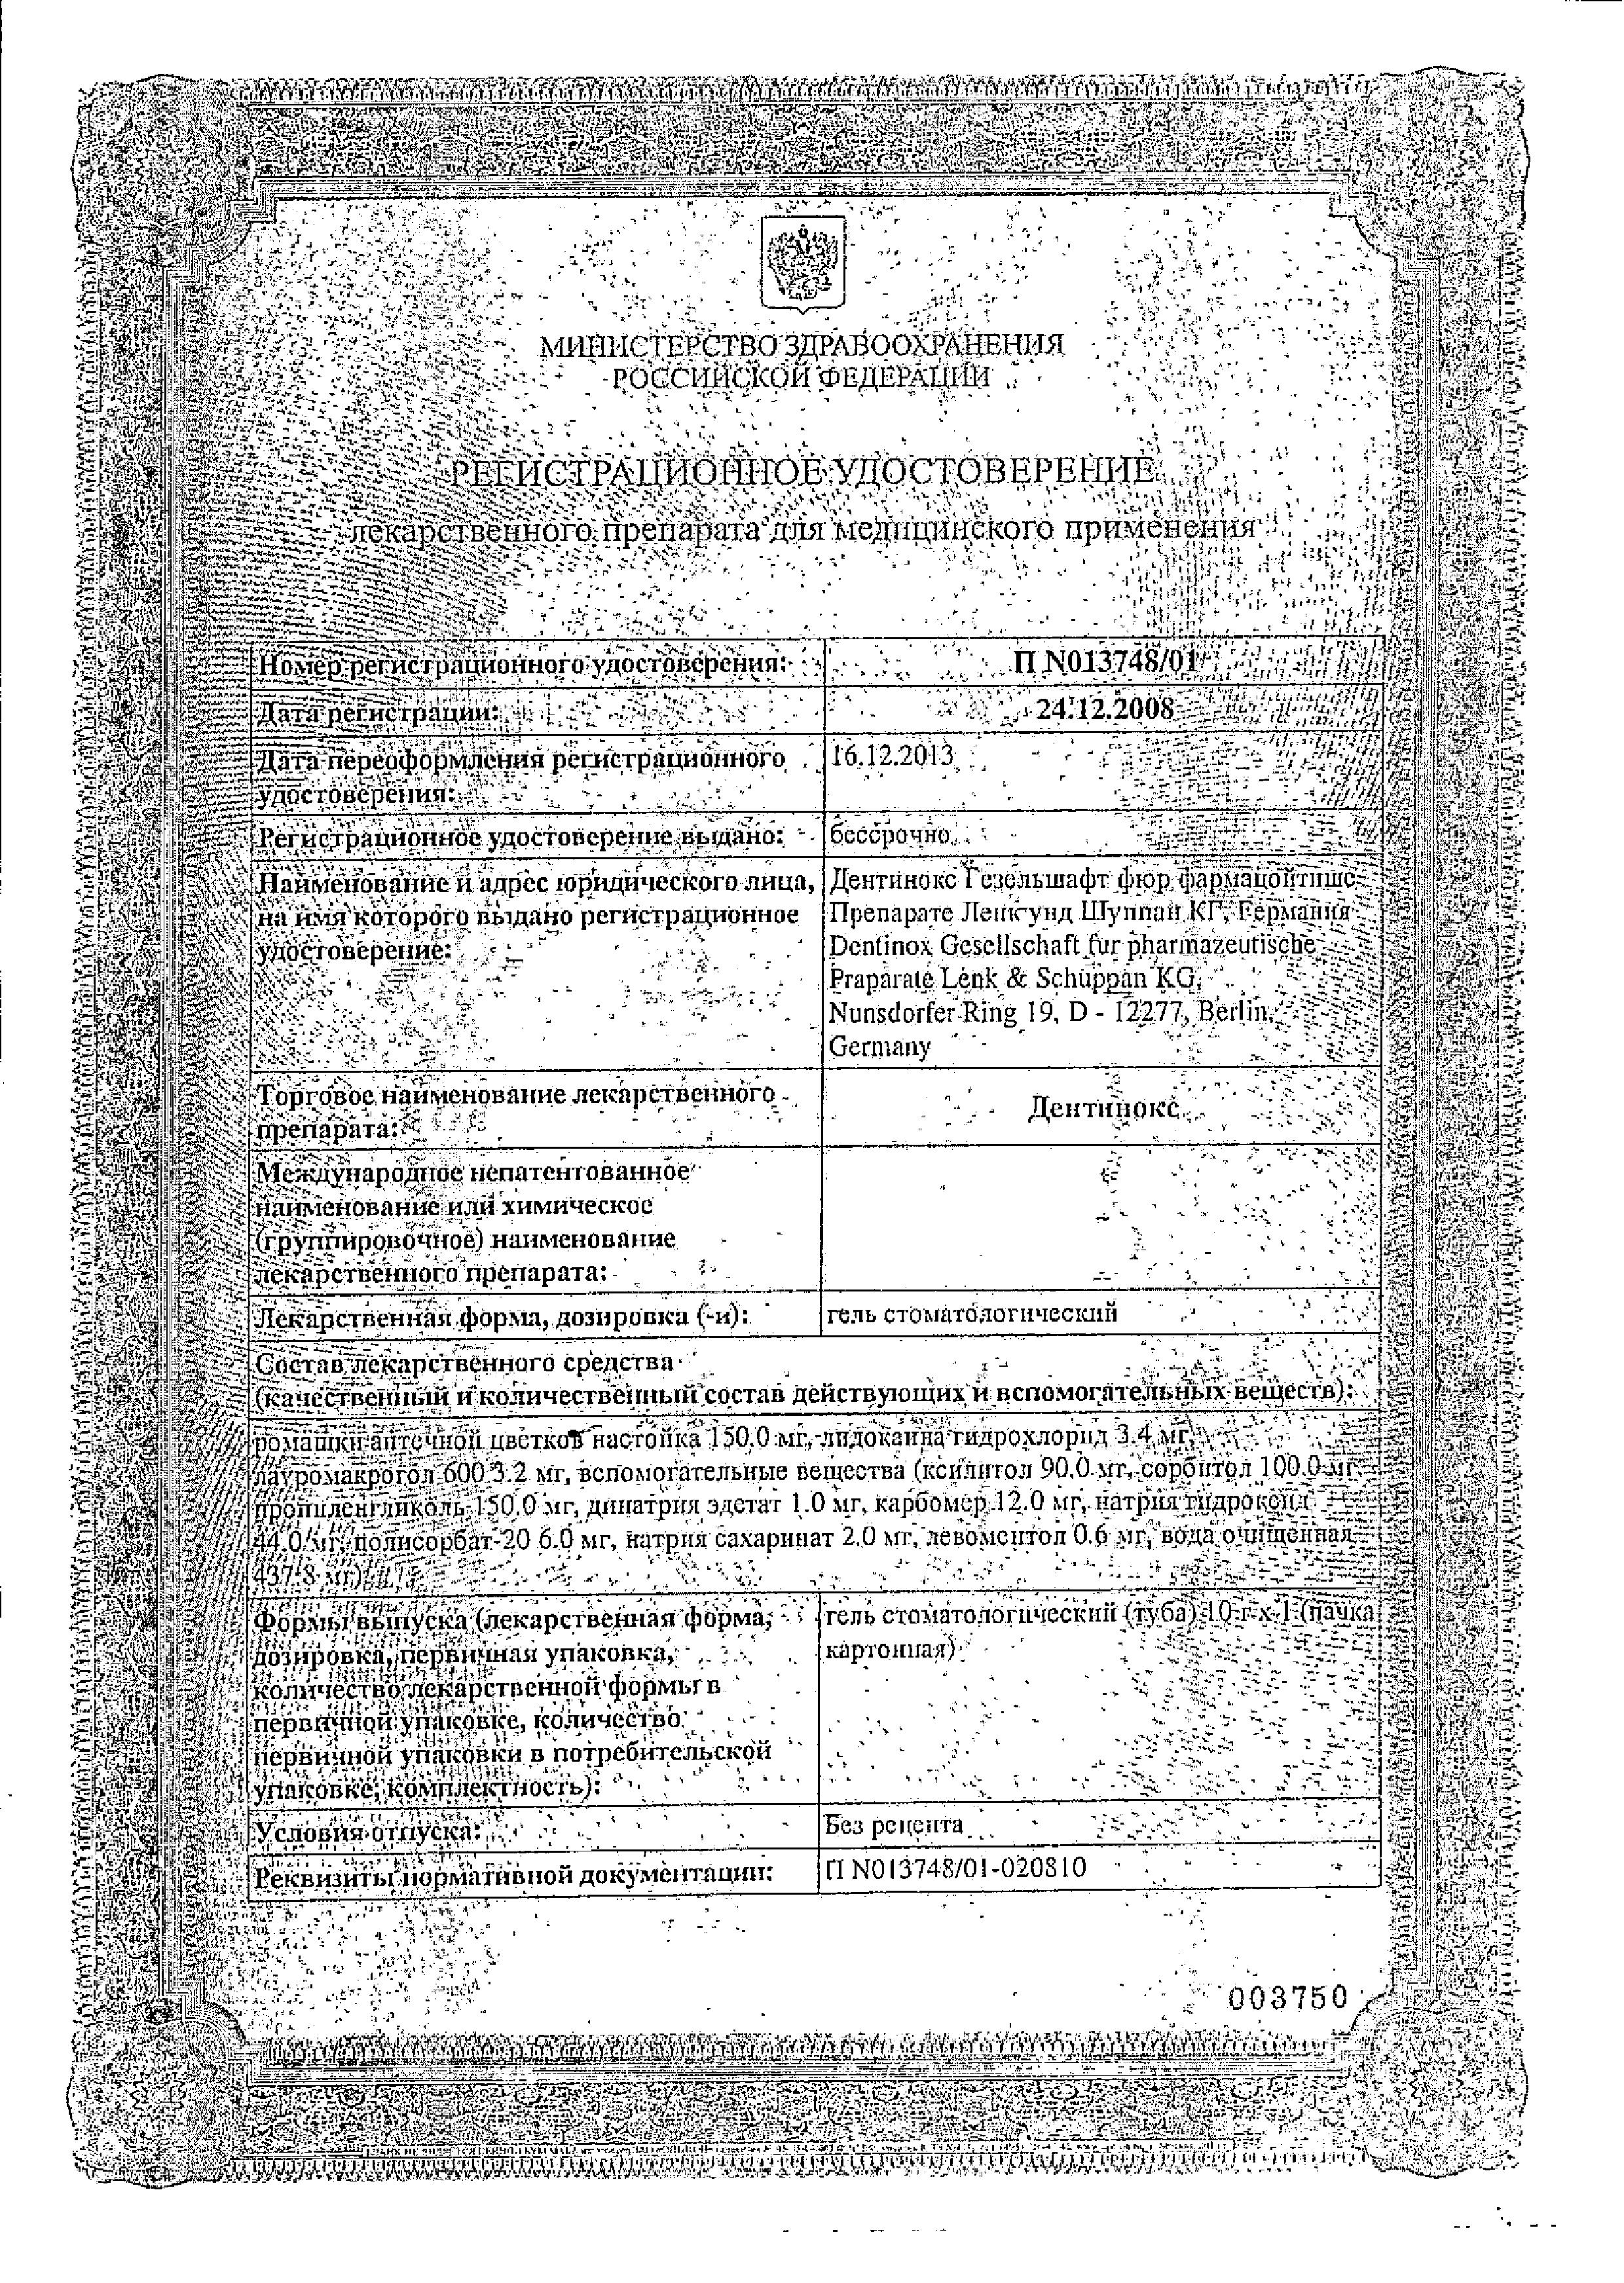 Дентинокс сертификат